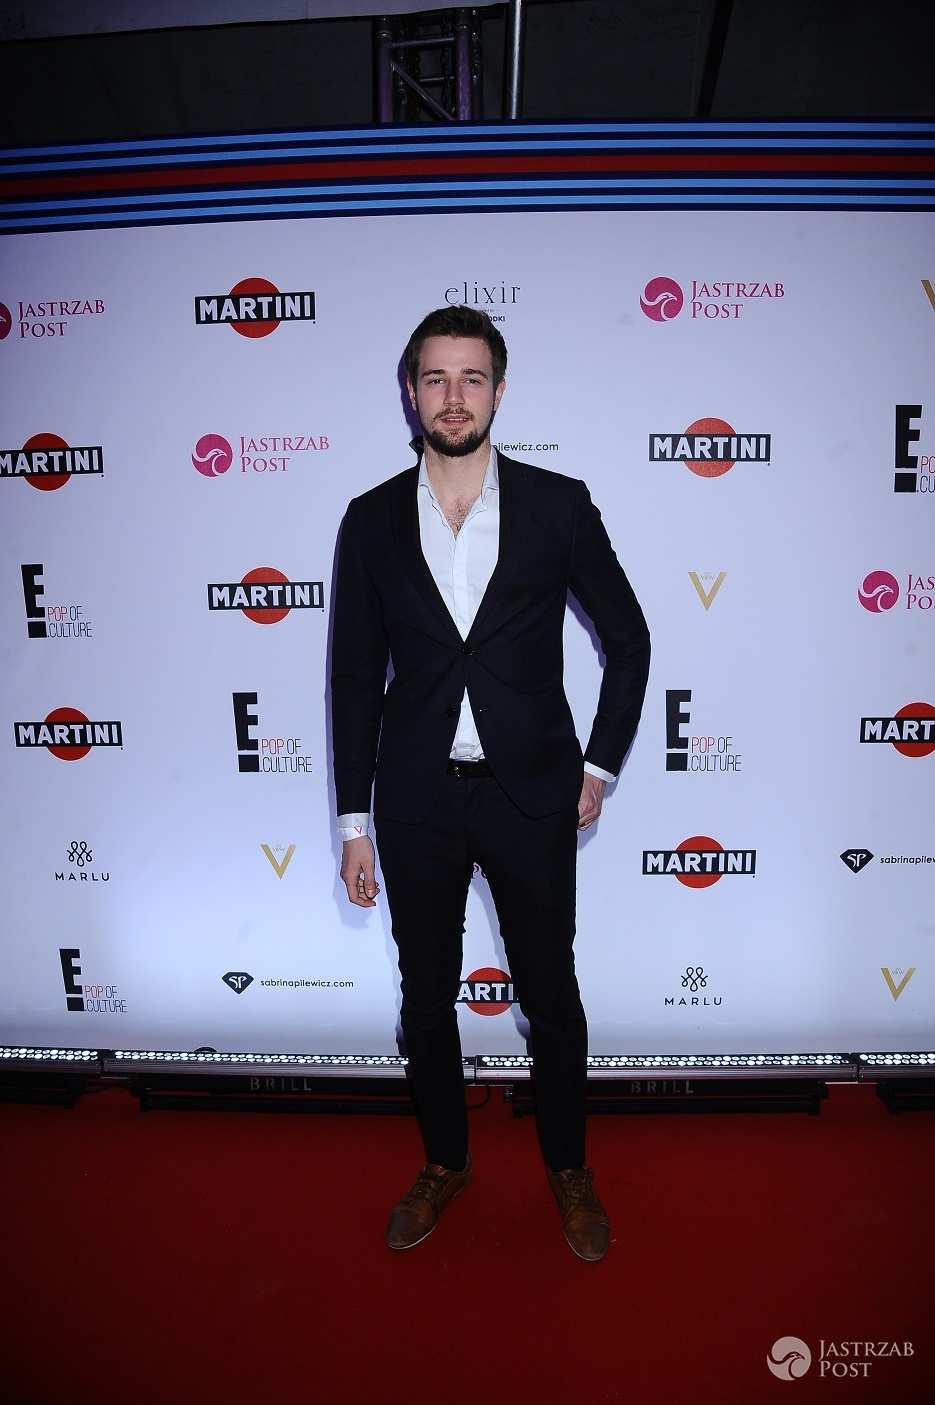 "Billboard 2016, impreza z Jastrząb Post, Martini i E! Entertainment - Mateusz Jarzębiak ""Góral"""